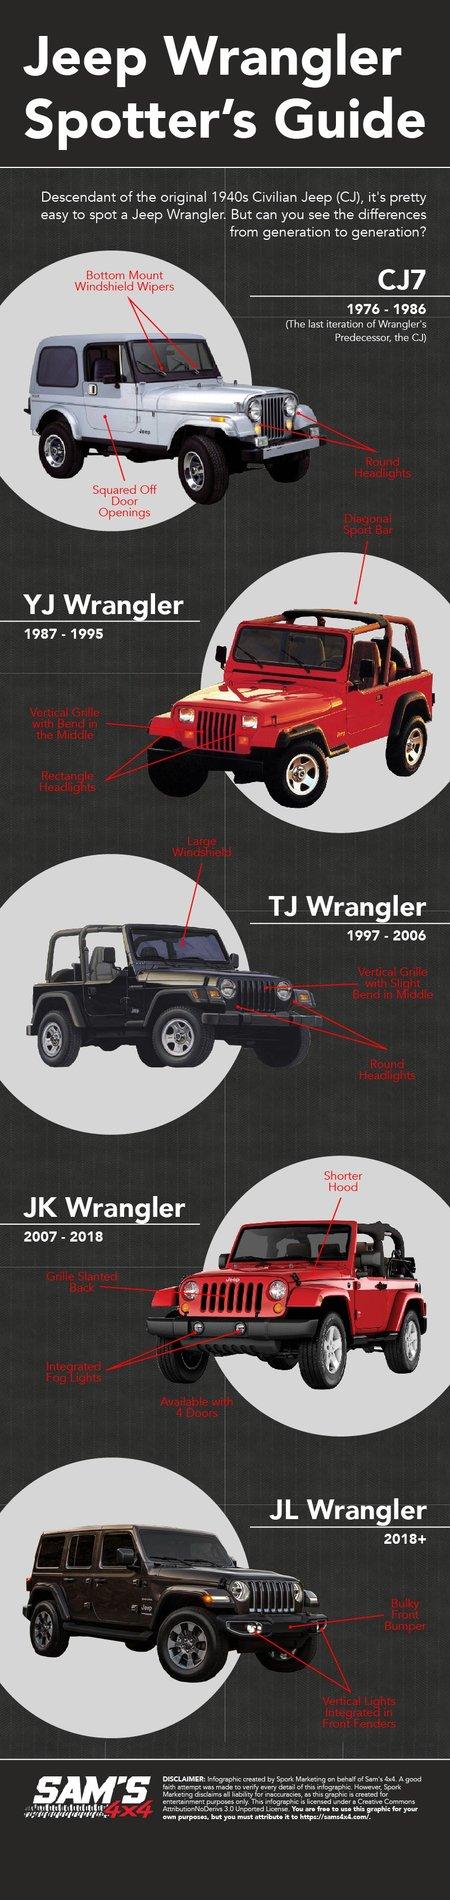 Jeep Wrangler Unlimited Comparison Chart : wrangler, unlimited, comparison, chart, Spotter's, Guide, 2018+, Wrangler, Forums, Rubicon,, Sahara,, Sport,, Unlimited, JLwranglerforums.com